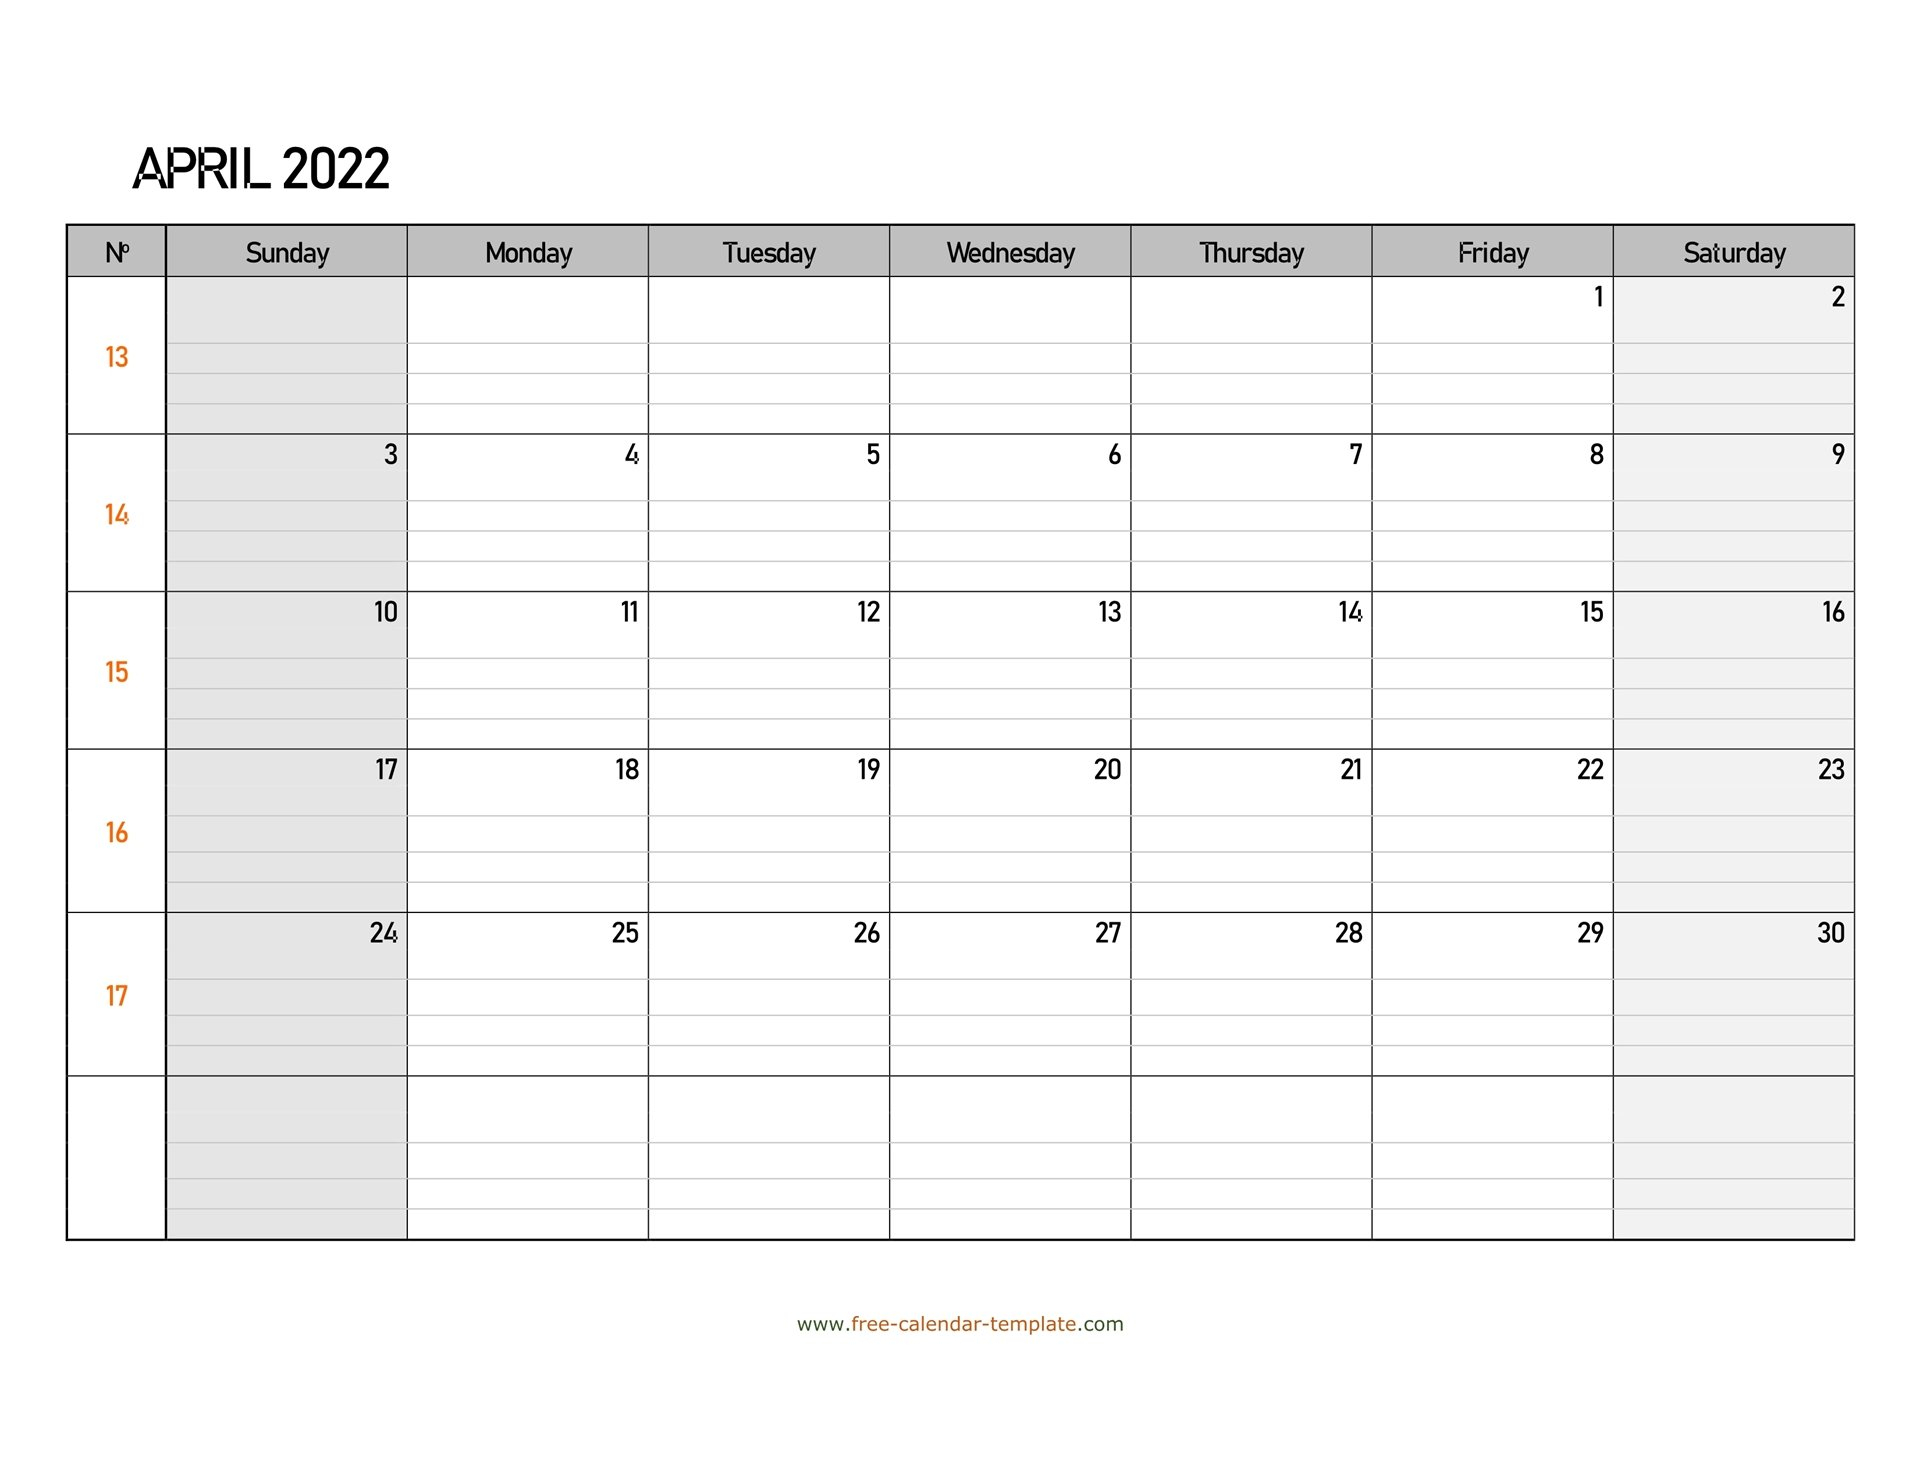 April 2022 Calendar Free Printable With Grid Lines inside April 2022 Calendar Printable Images Photo